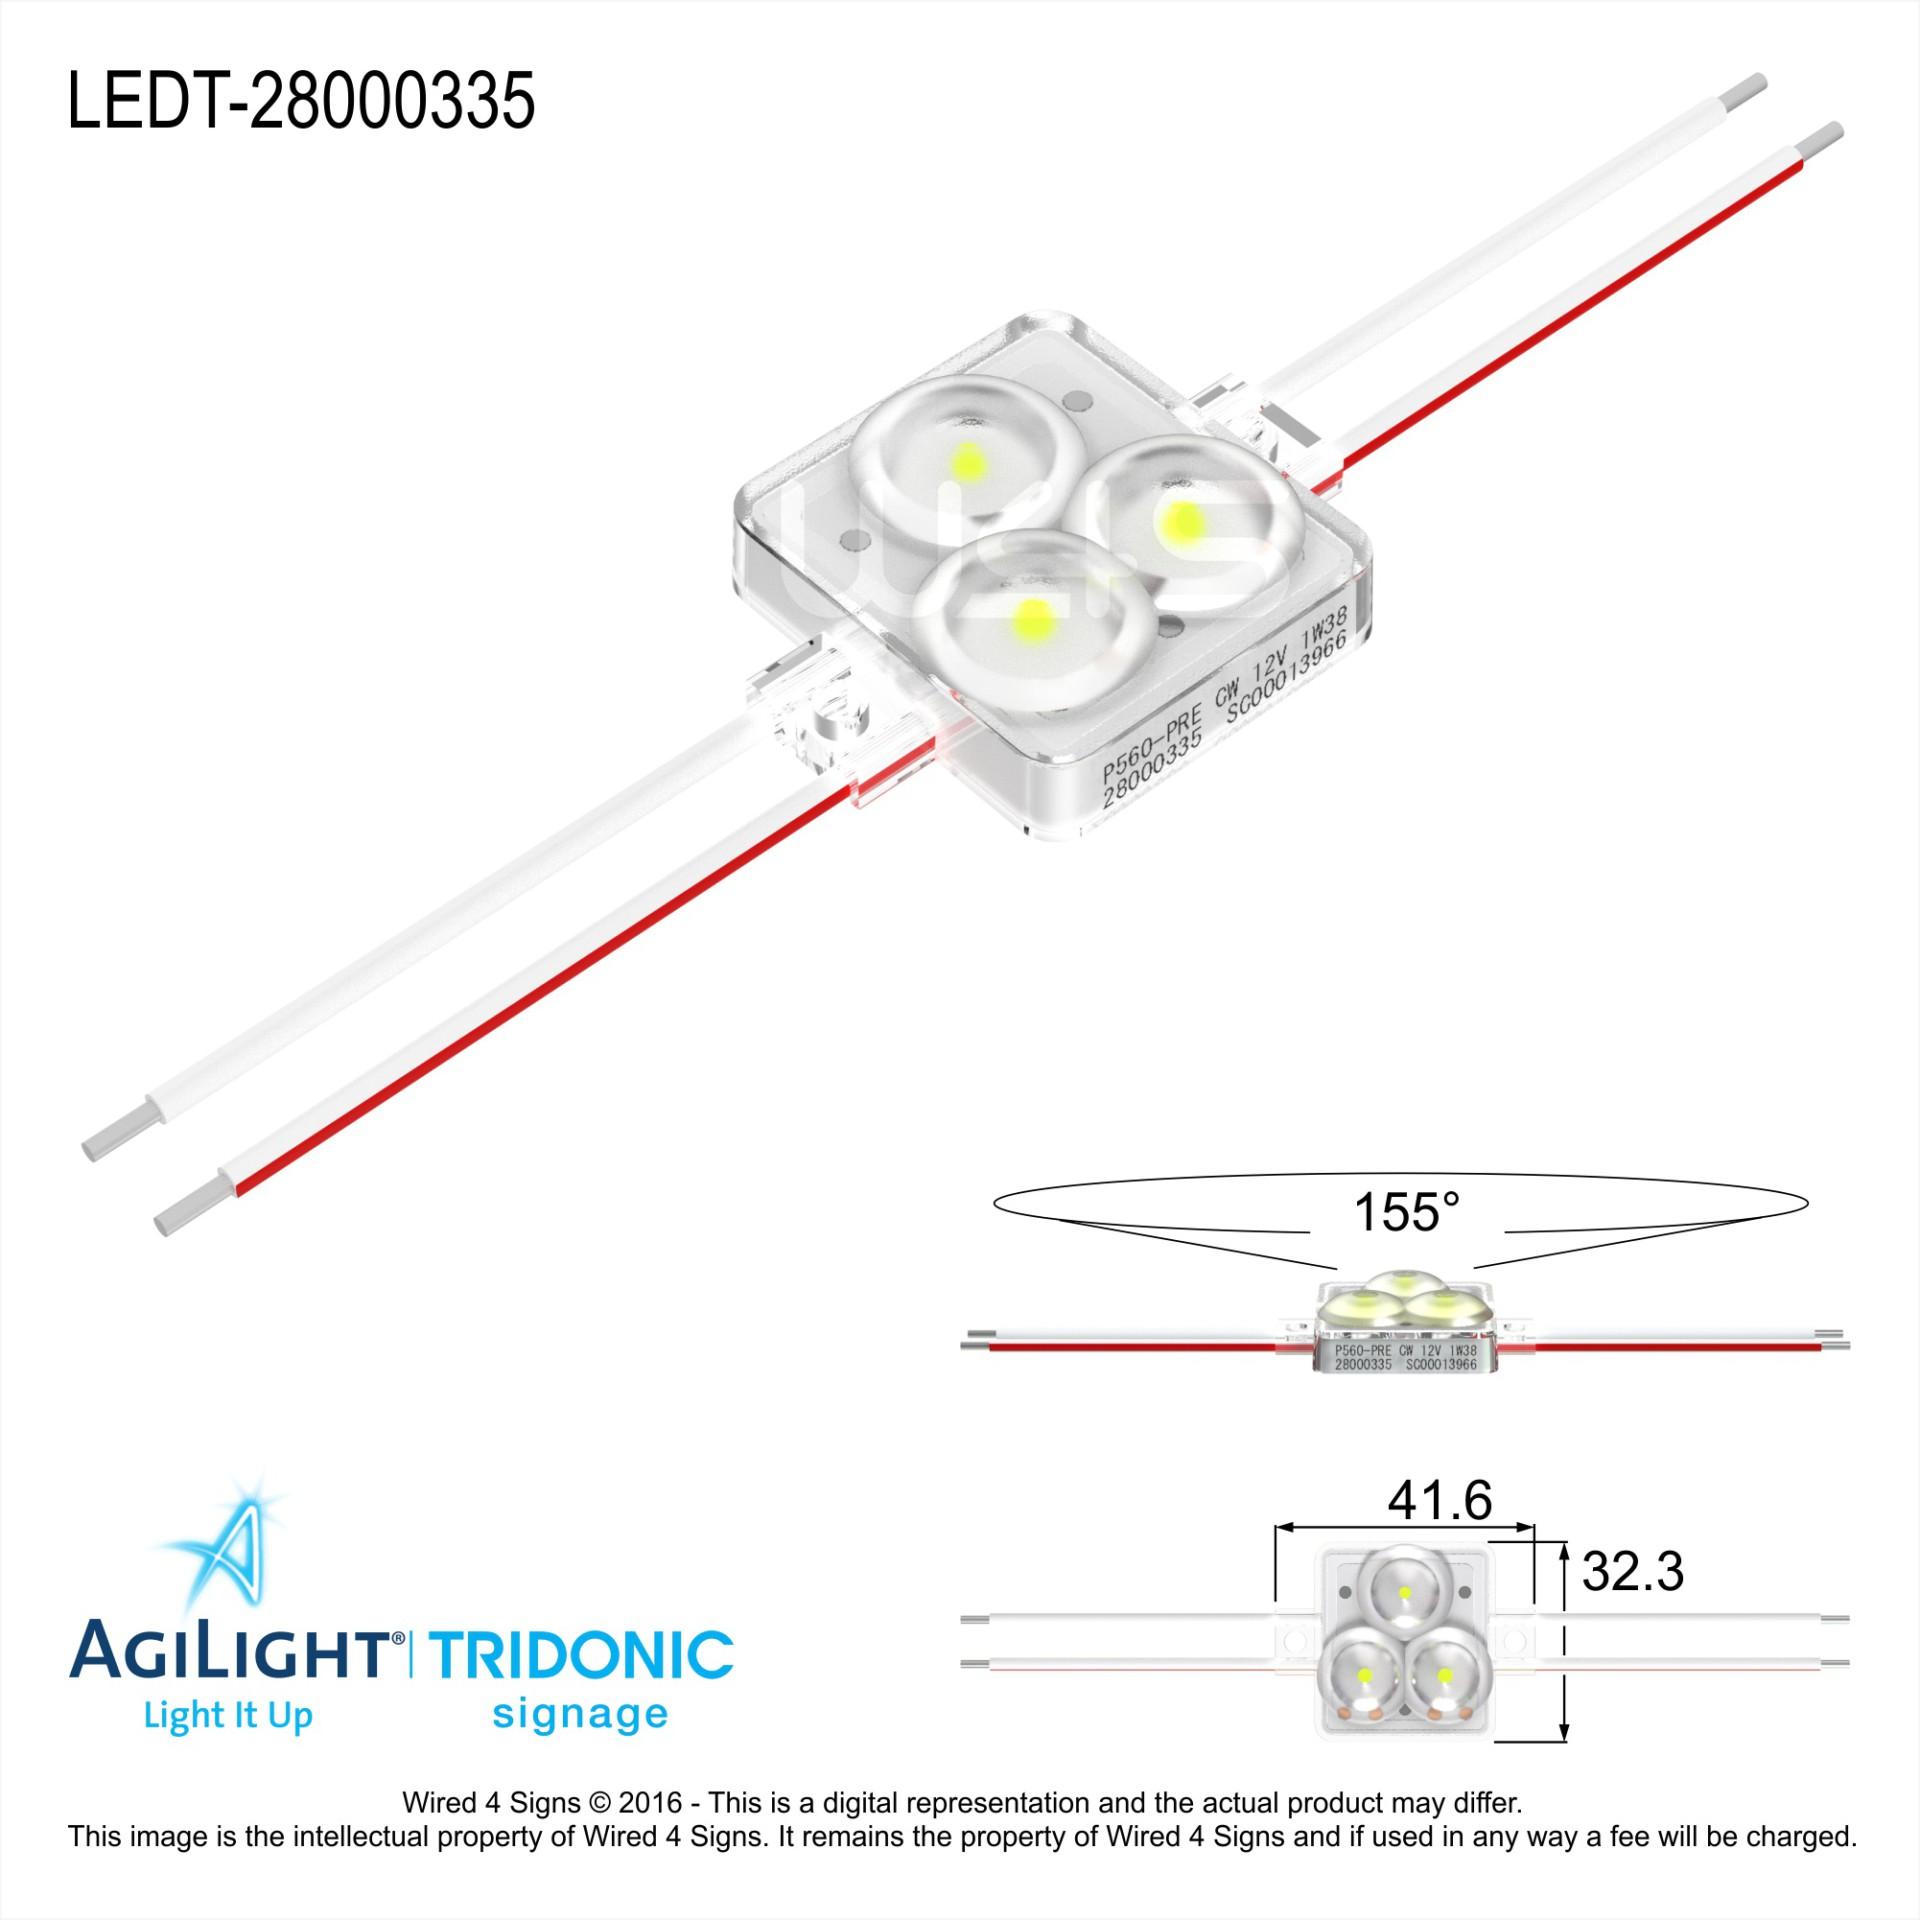 Led Light Fittings Durban: LED Strip Lights Port Elizabeth